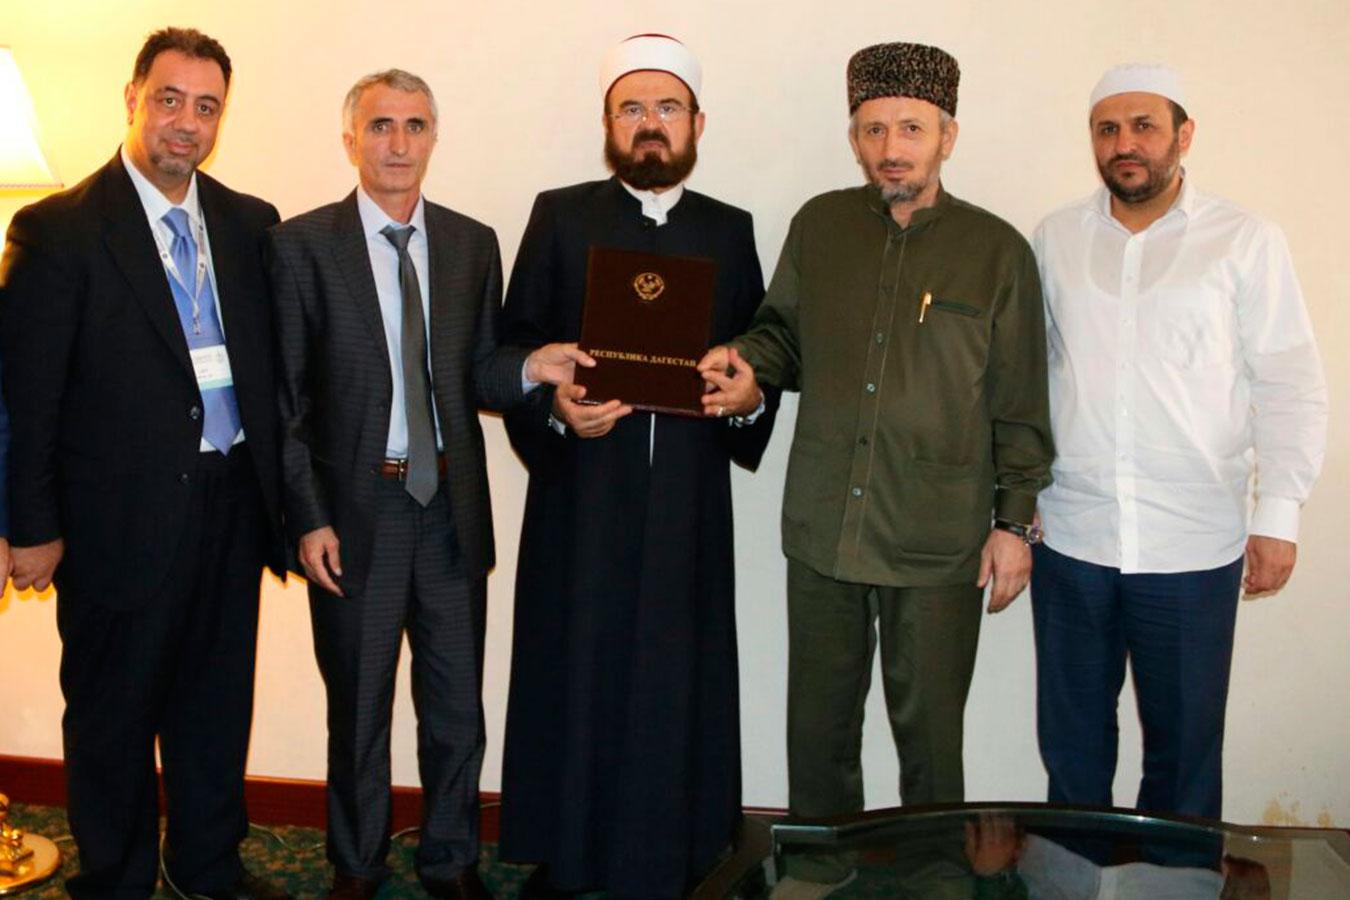 Декларация ВСМУ: законопослушание, интеграция, неприятие экстремизма